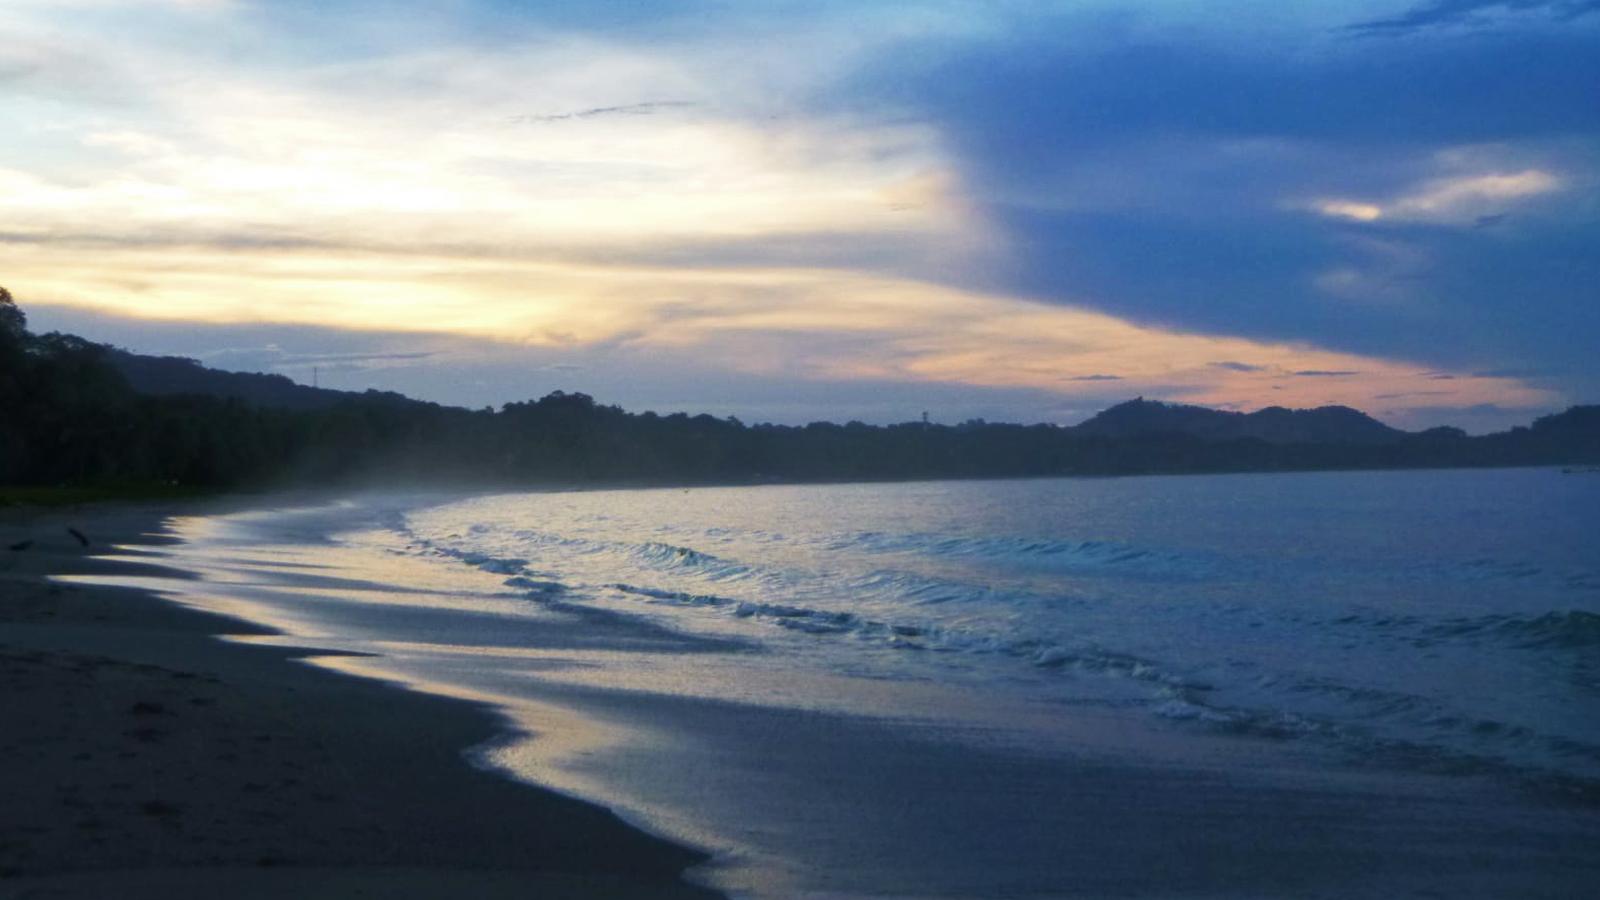 Costa Rica & Panama Erlebnisreise Gruppenreise Urlaub für junge Leute traveljunkies